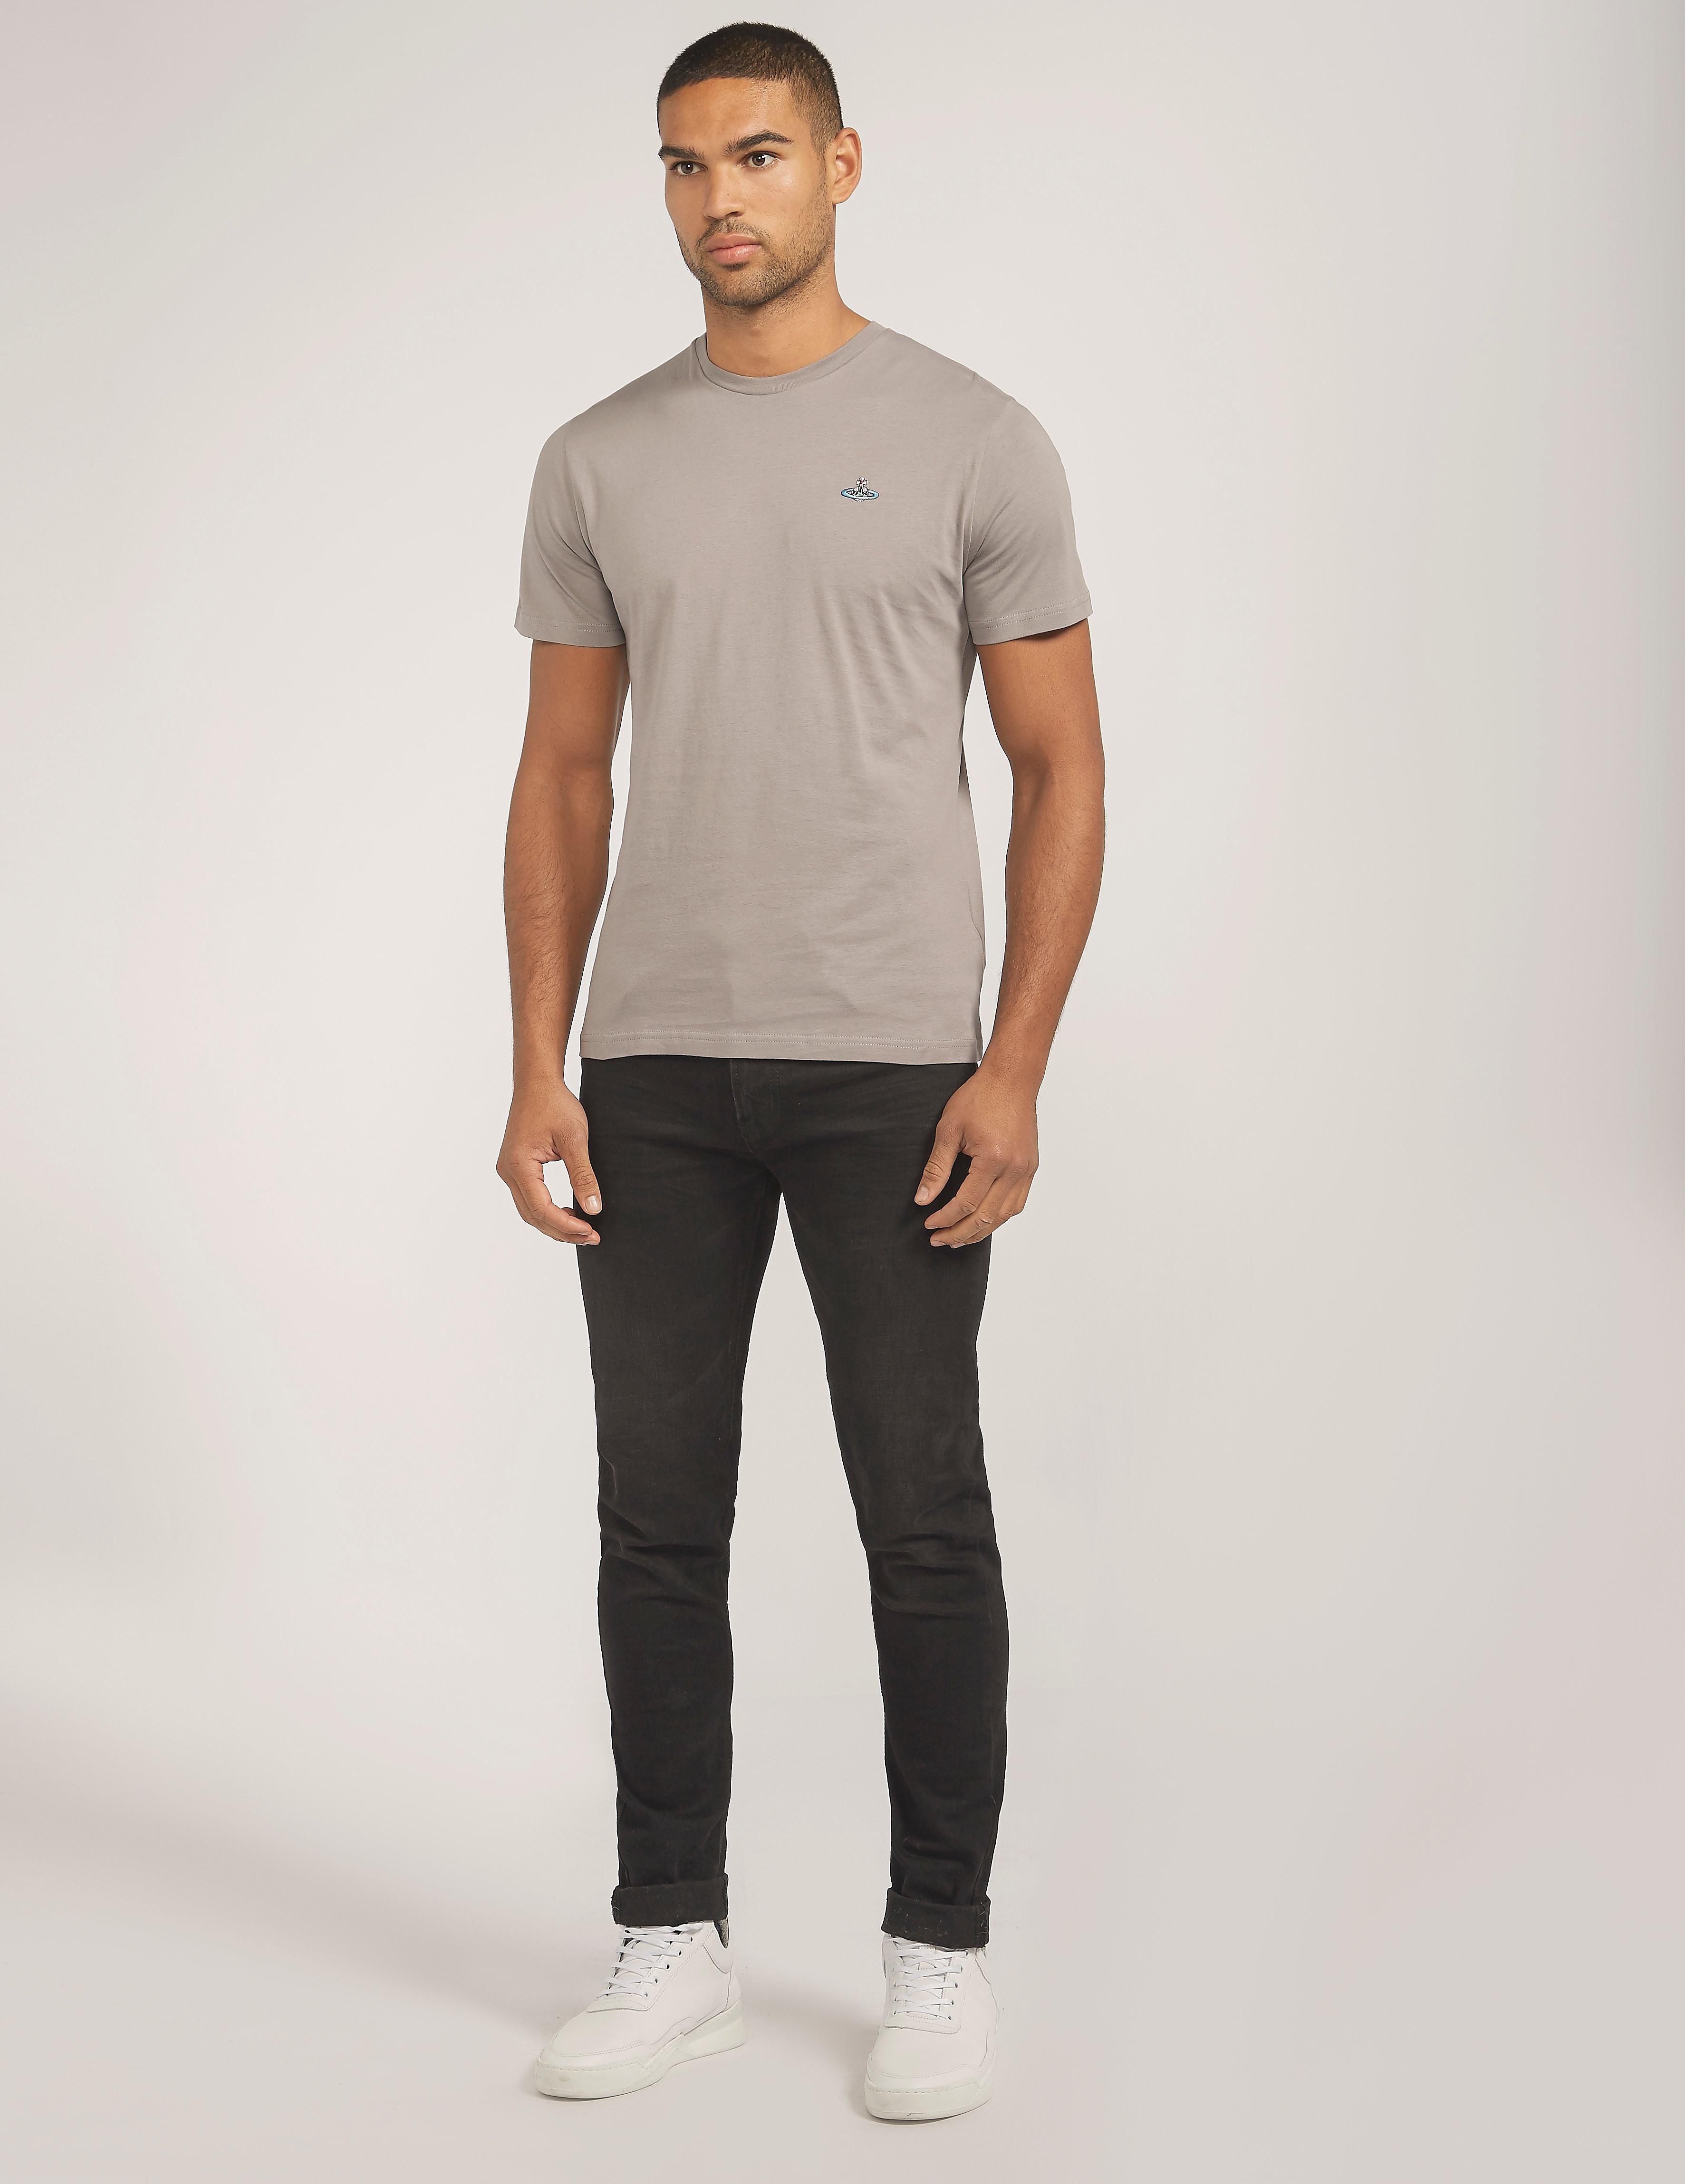 Vivienne Westwood Crew Orb T-Shirt